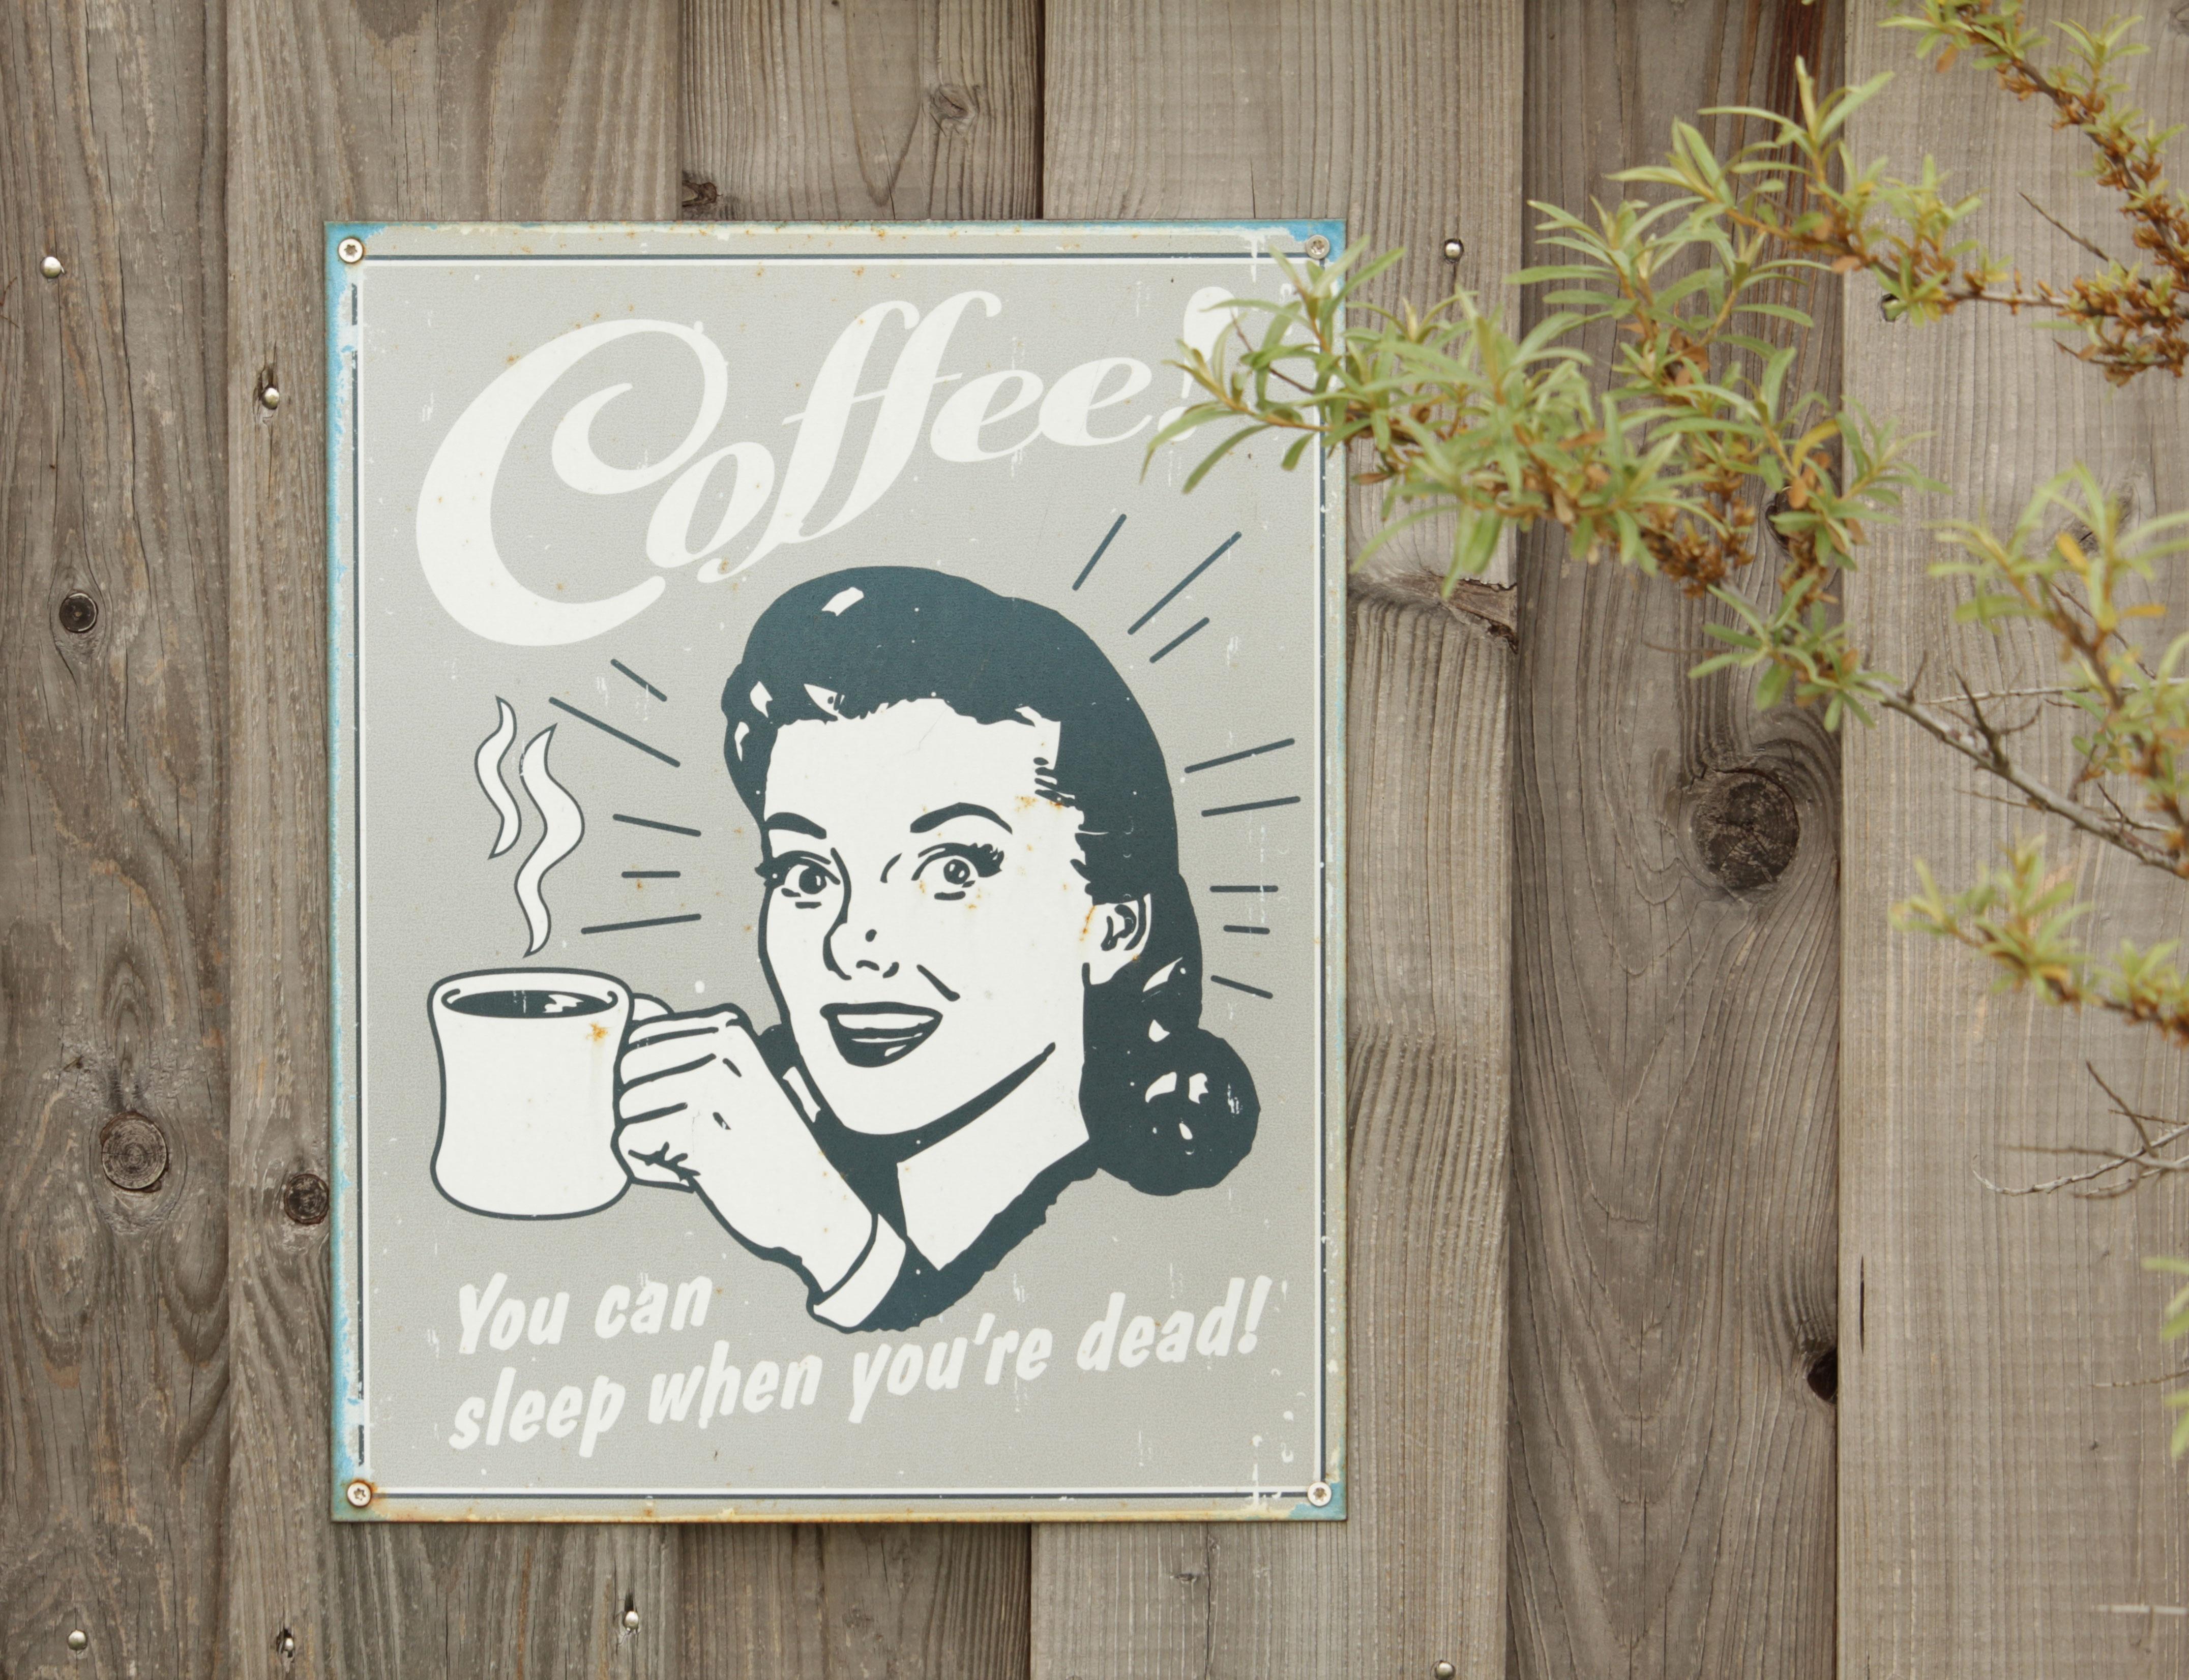 Kaffee Zitate